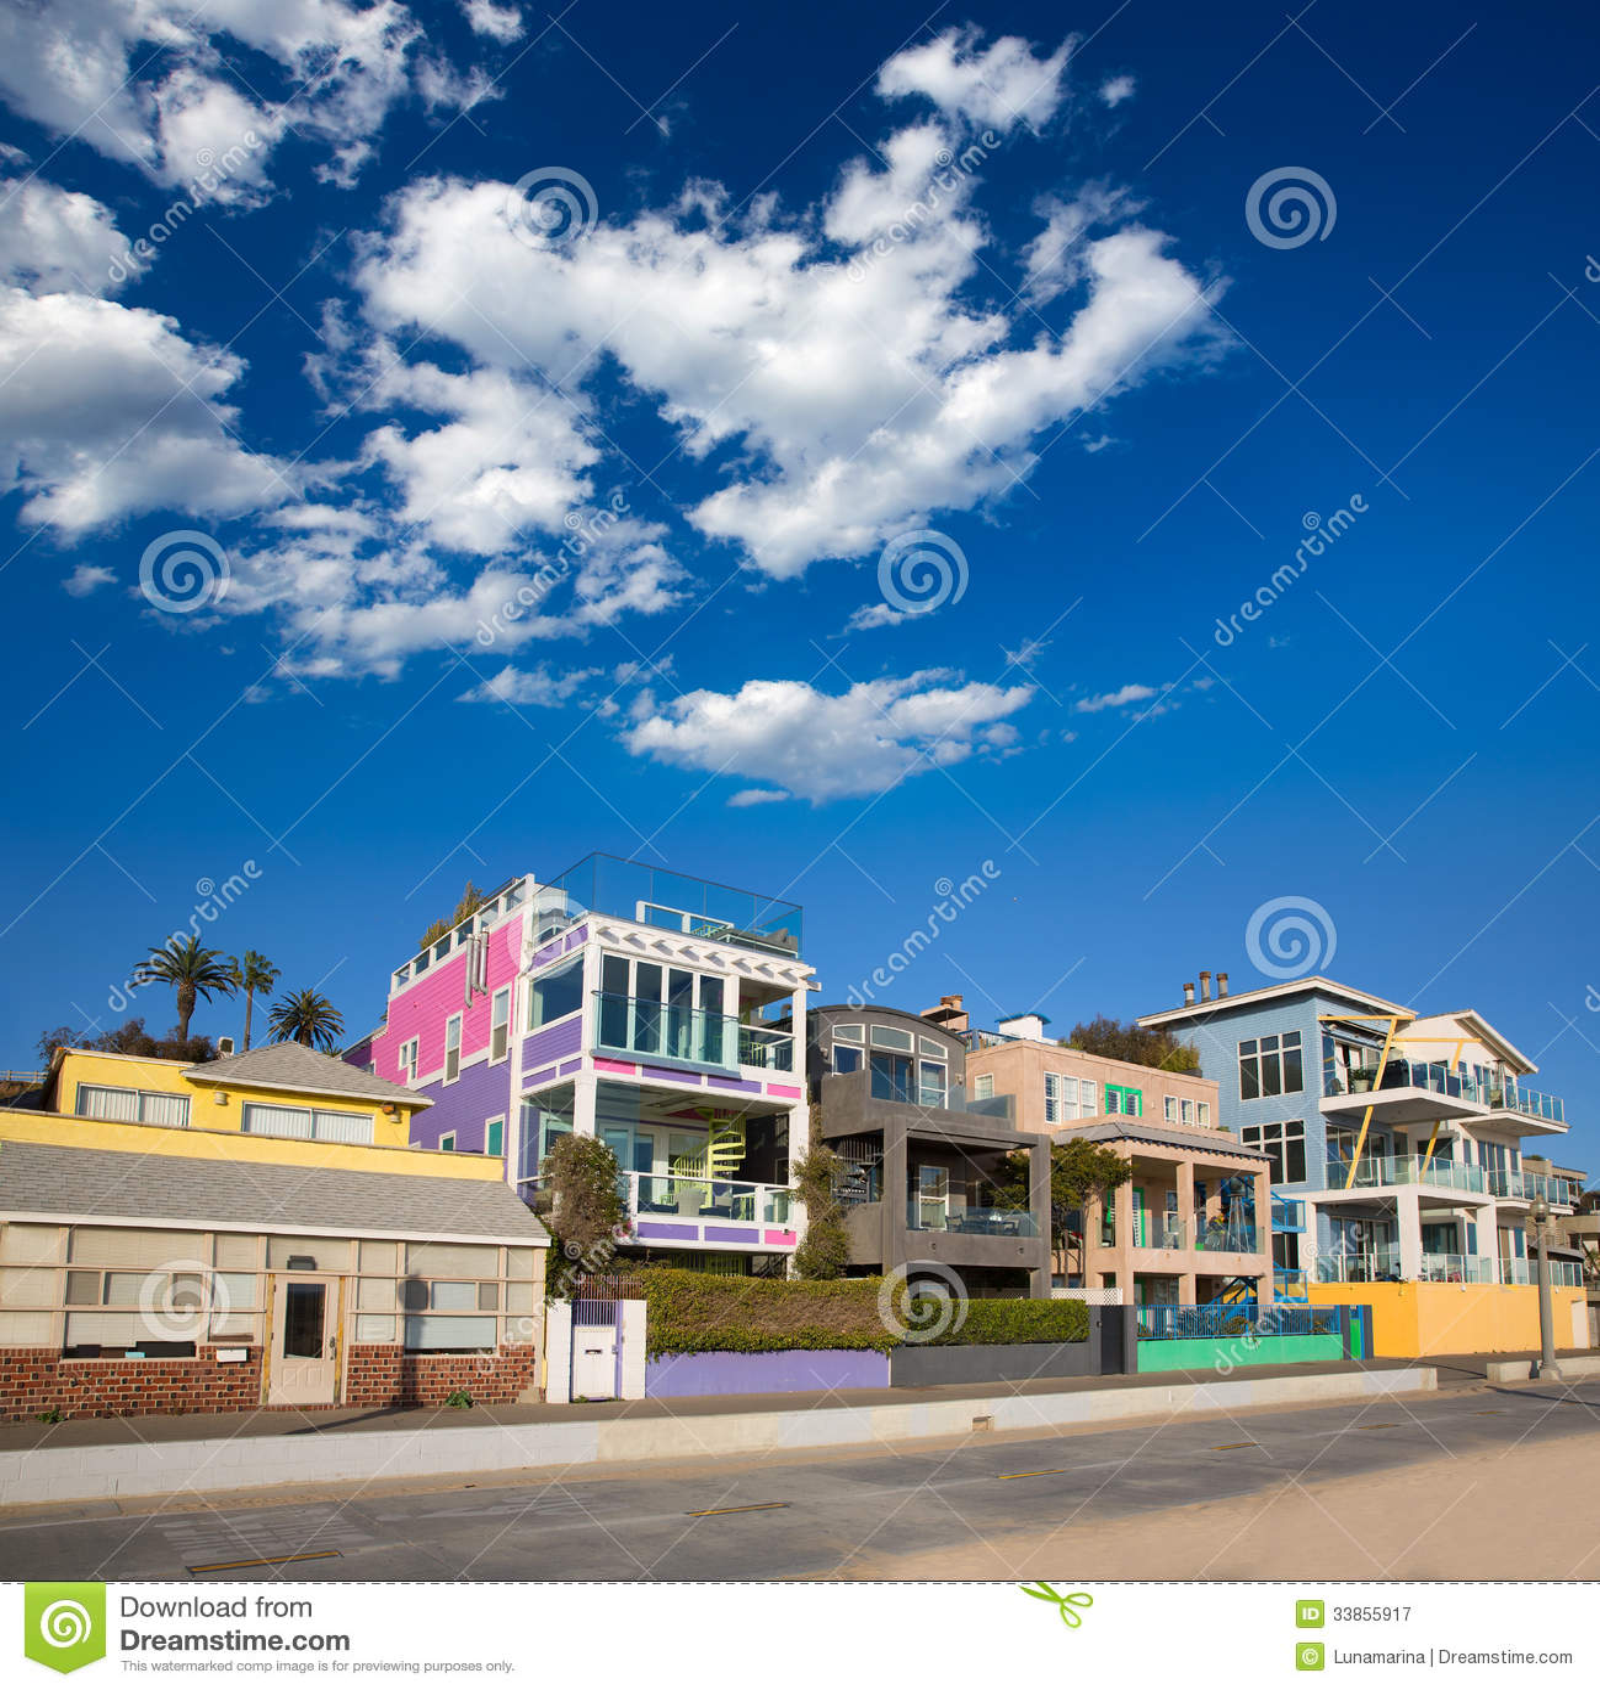 Pacific City Beach House Rentals: Santa Monica California Beach Colorful Houses Royalty Free